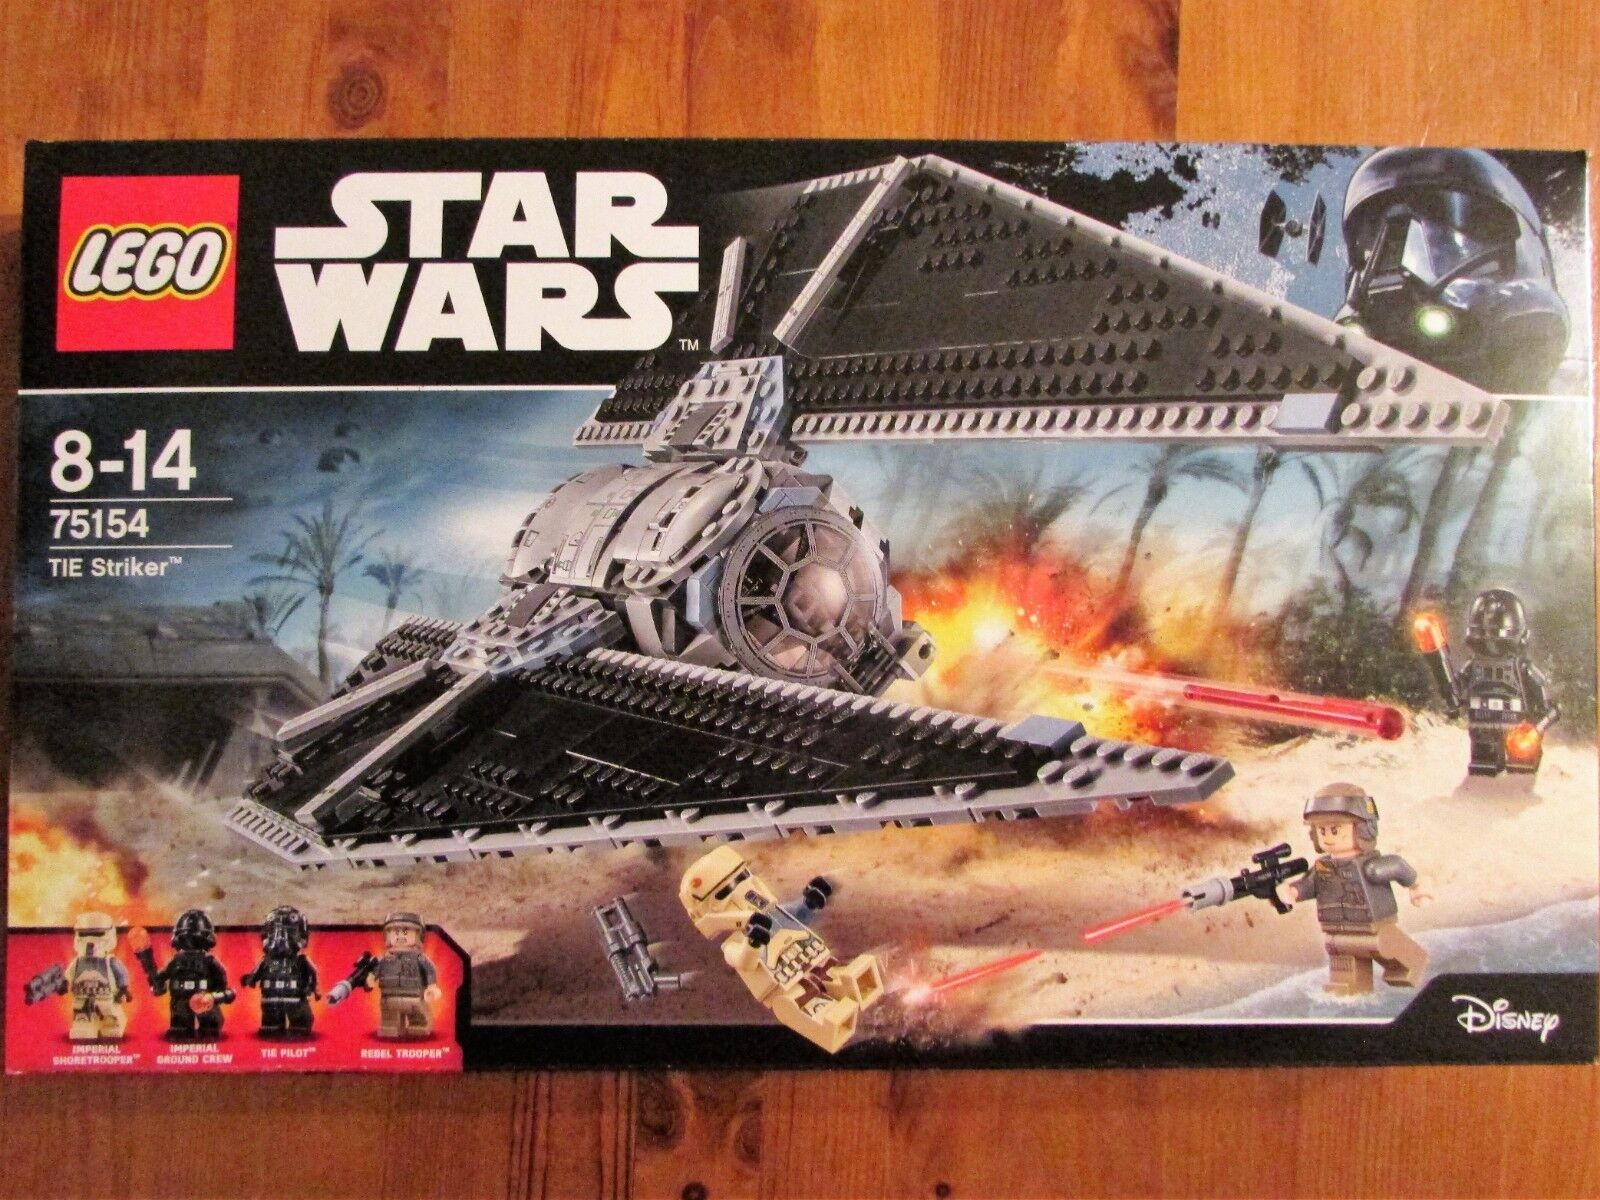 LEGO LEGO LEGO set 75154 STAR WARS Tie Striker MISB 8ce28d